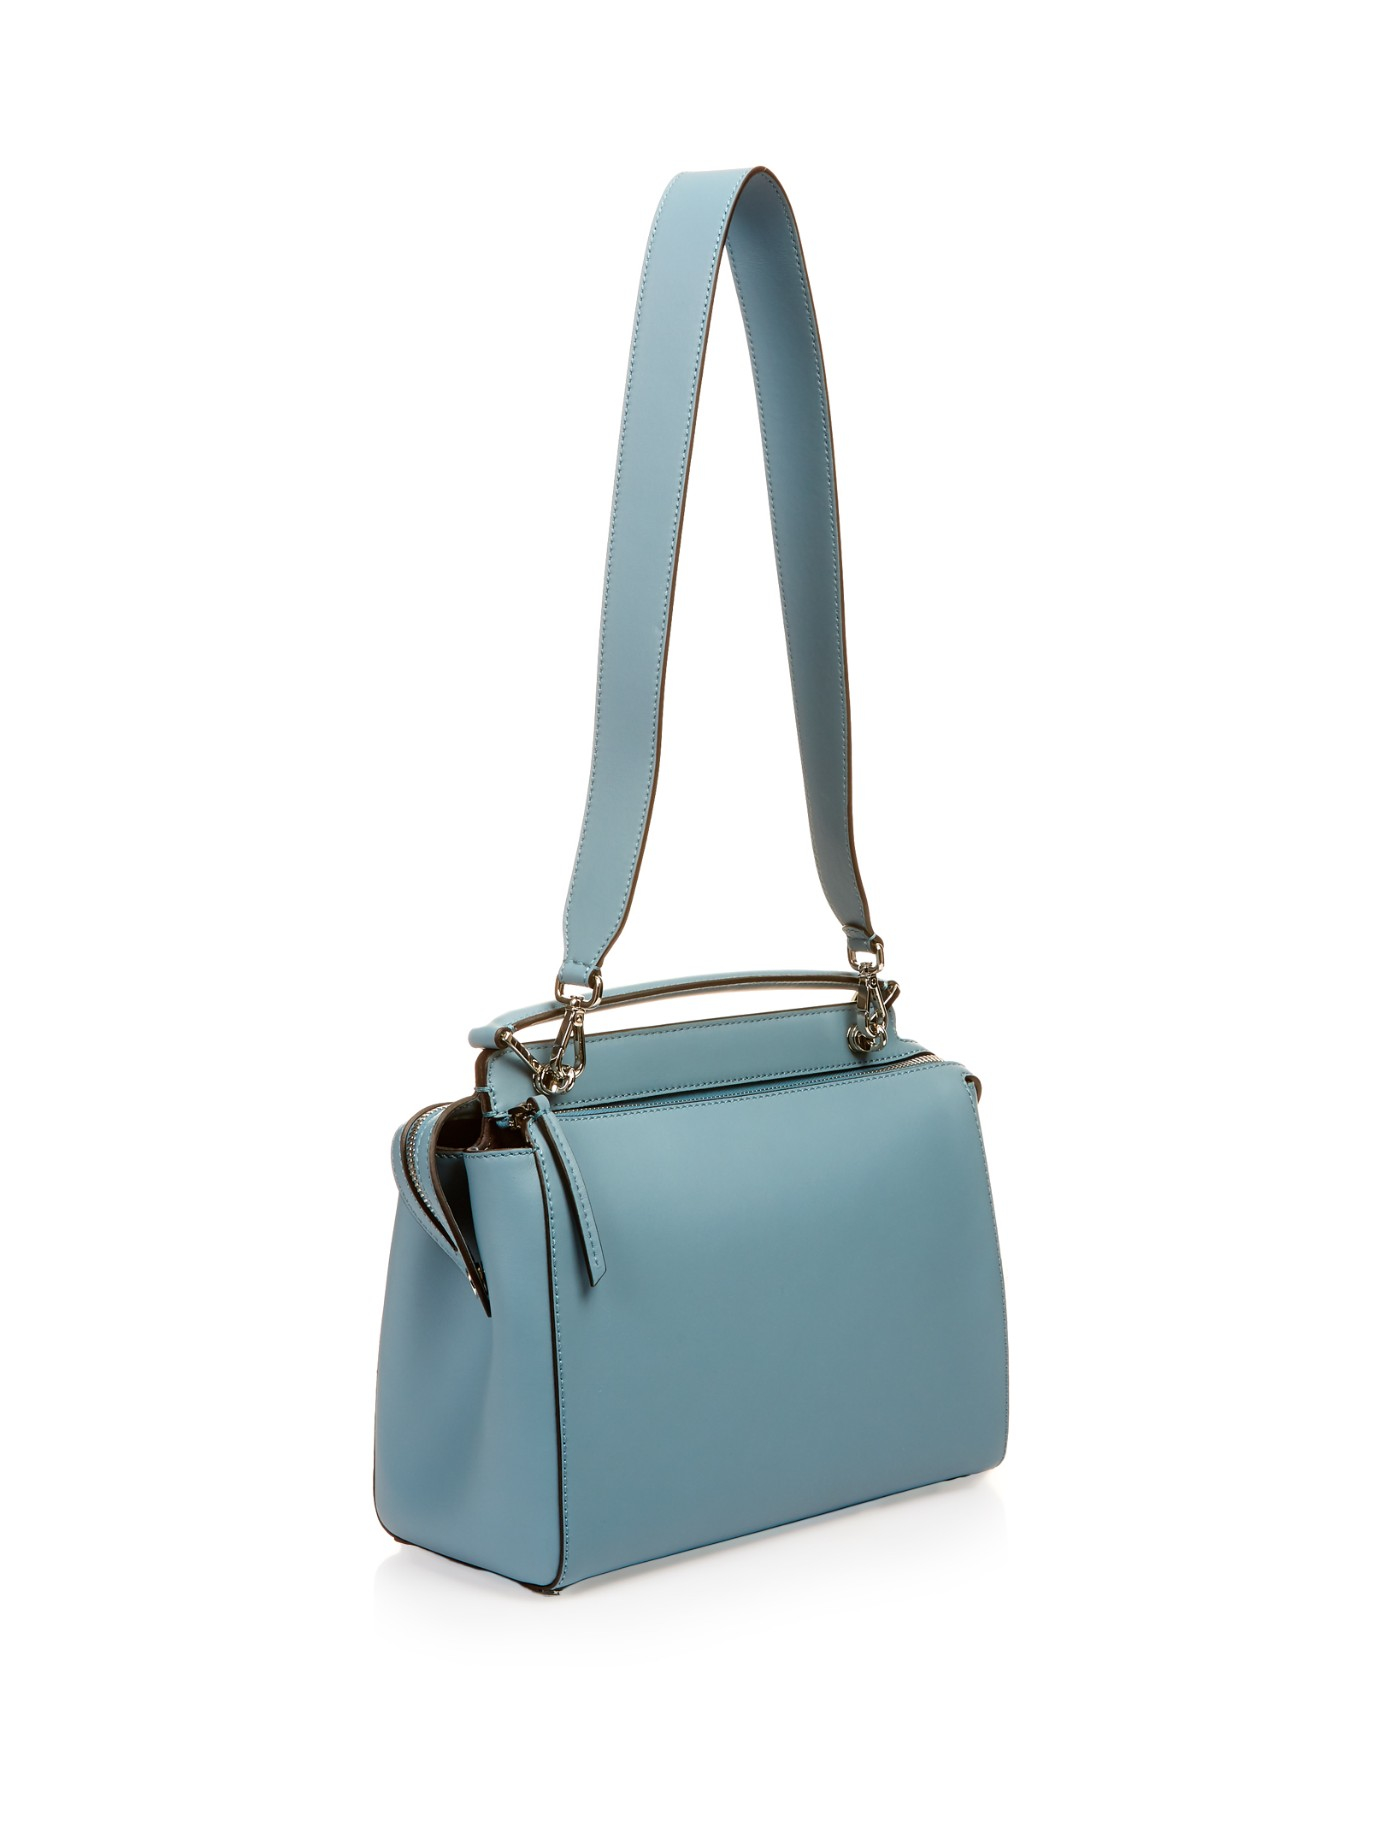 59fd7d335d0 Fendi Dotcom Leather Bag in Blue - Lyst